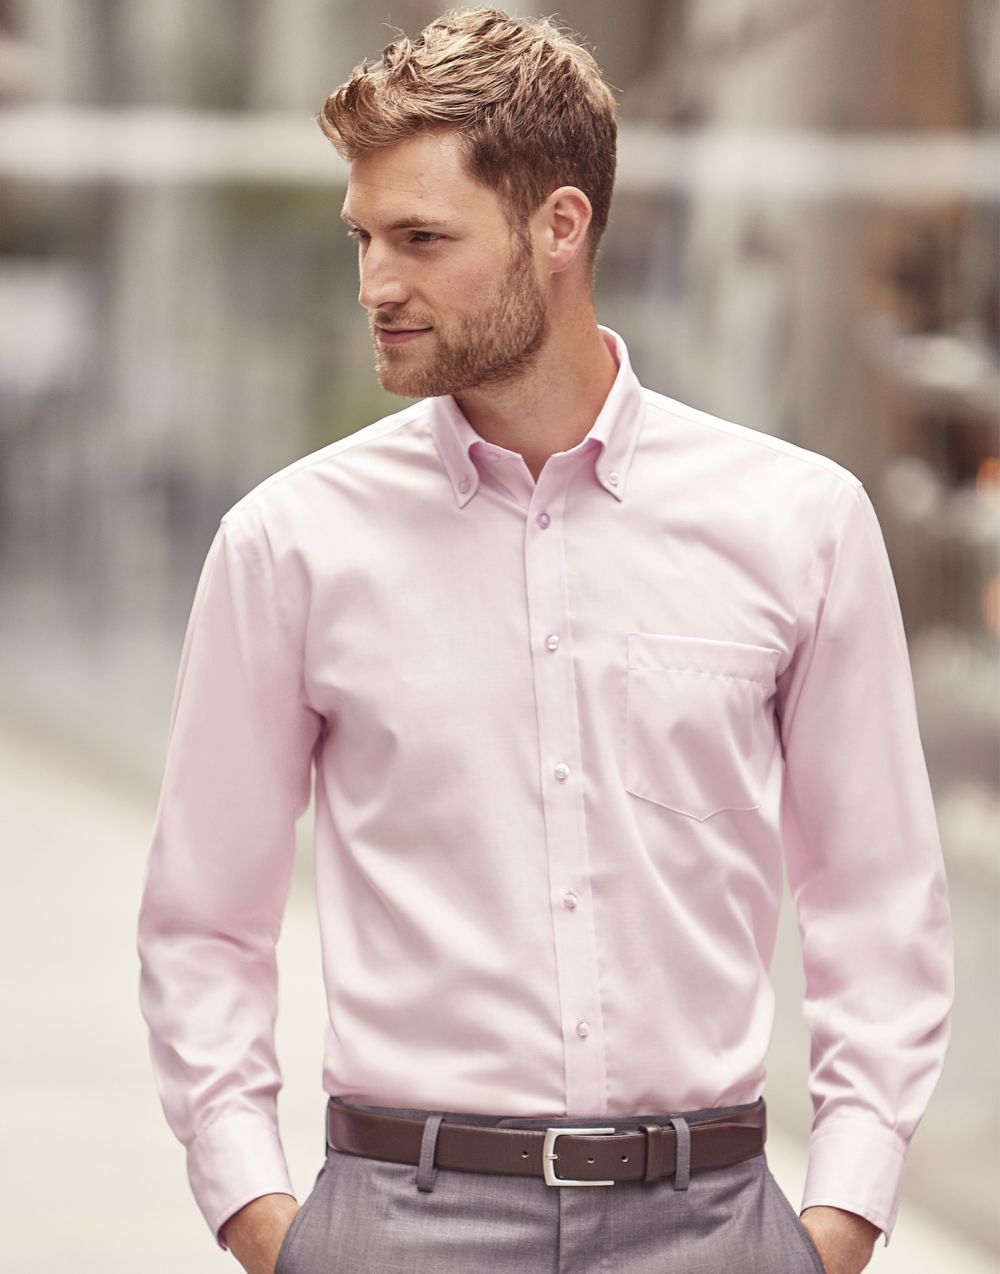 Camisas manga larga russell manga larga hombre con impresión vista 3